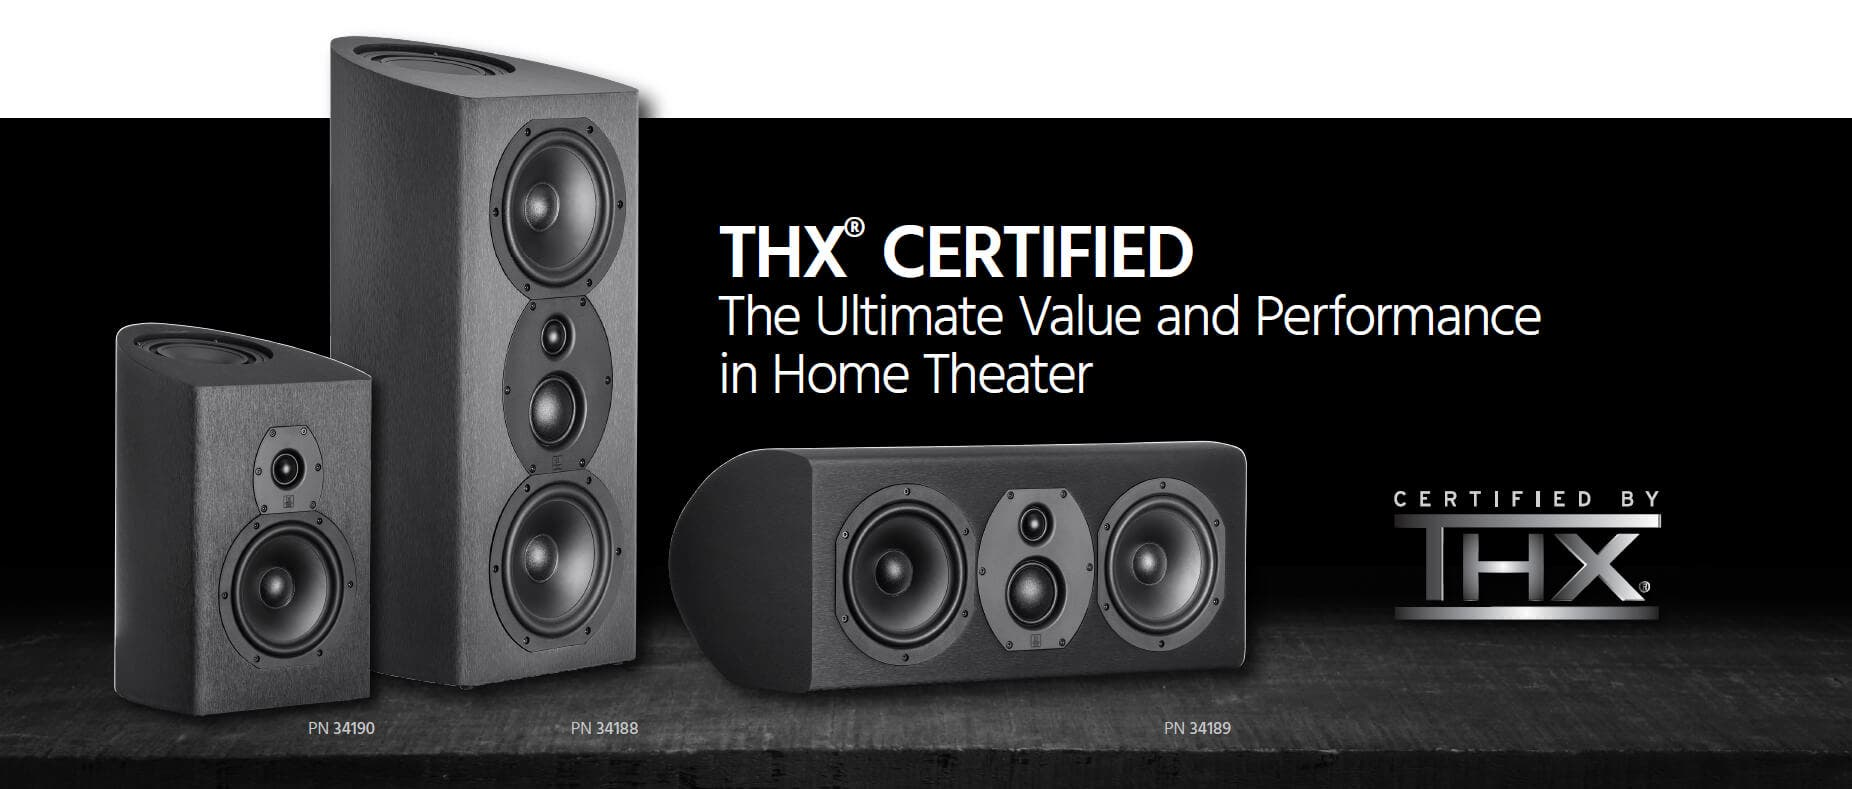 THX-365T